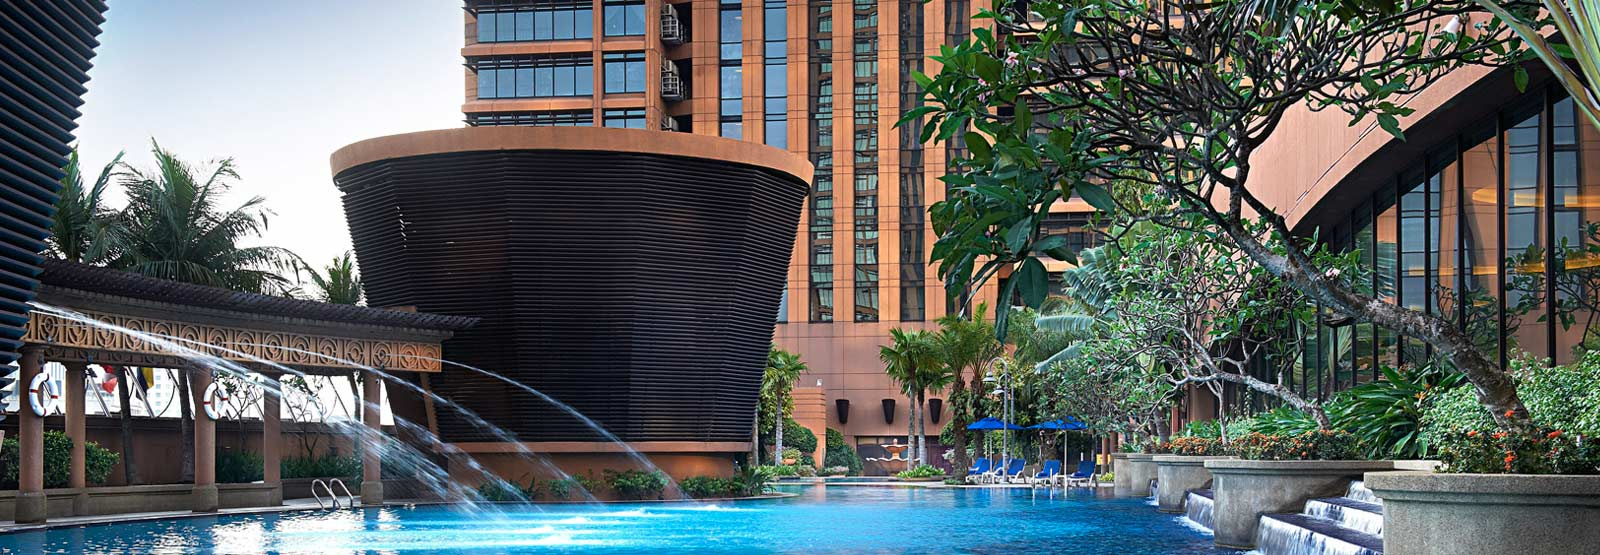 Image result for berjaya times square hotel kuala lumpur